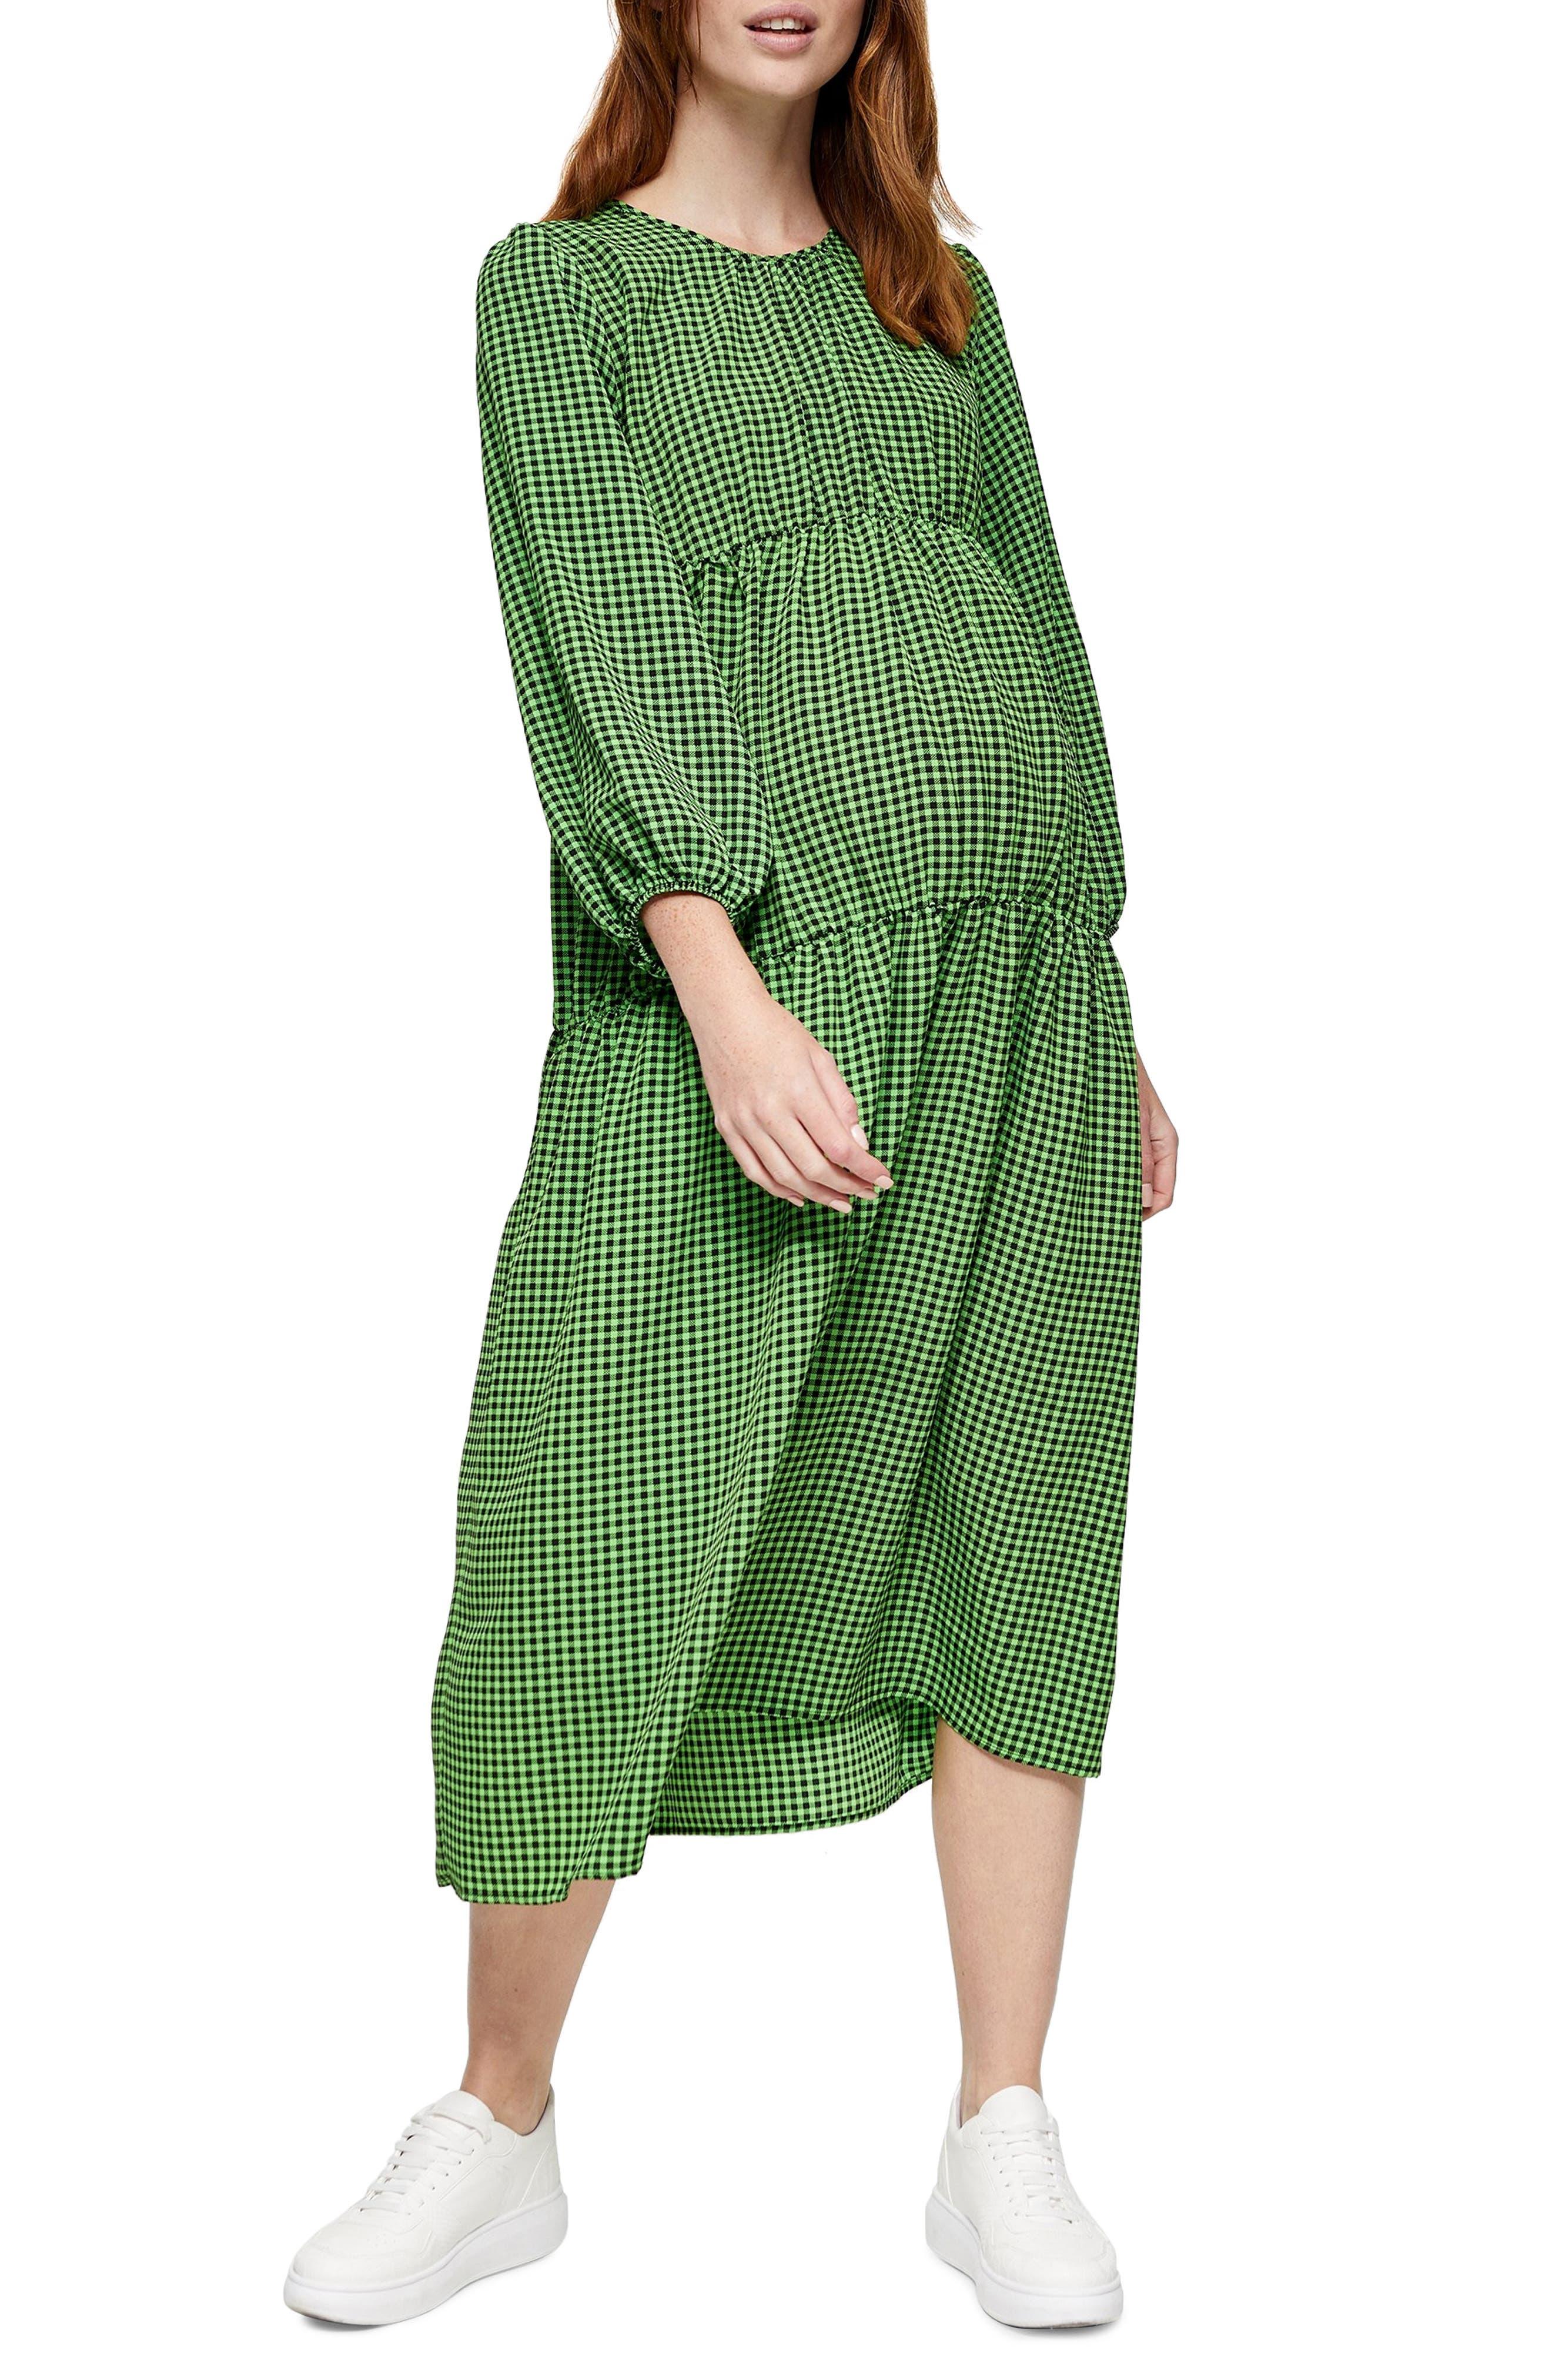 Vintage Maternity Dresses and Clothes Womens Topshop Gingham Smocked Long Sleeve Maternity Midi Dress $85.00 AT vintagedancer.com